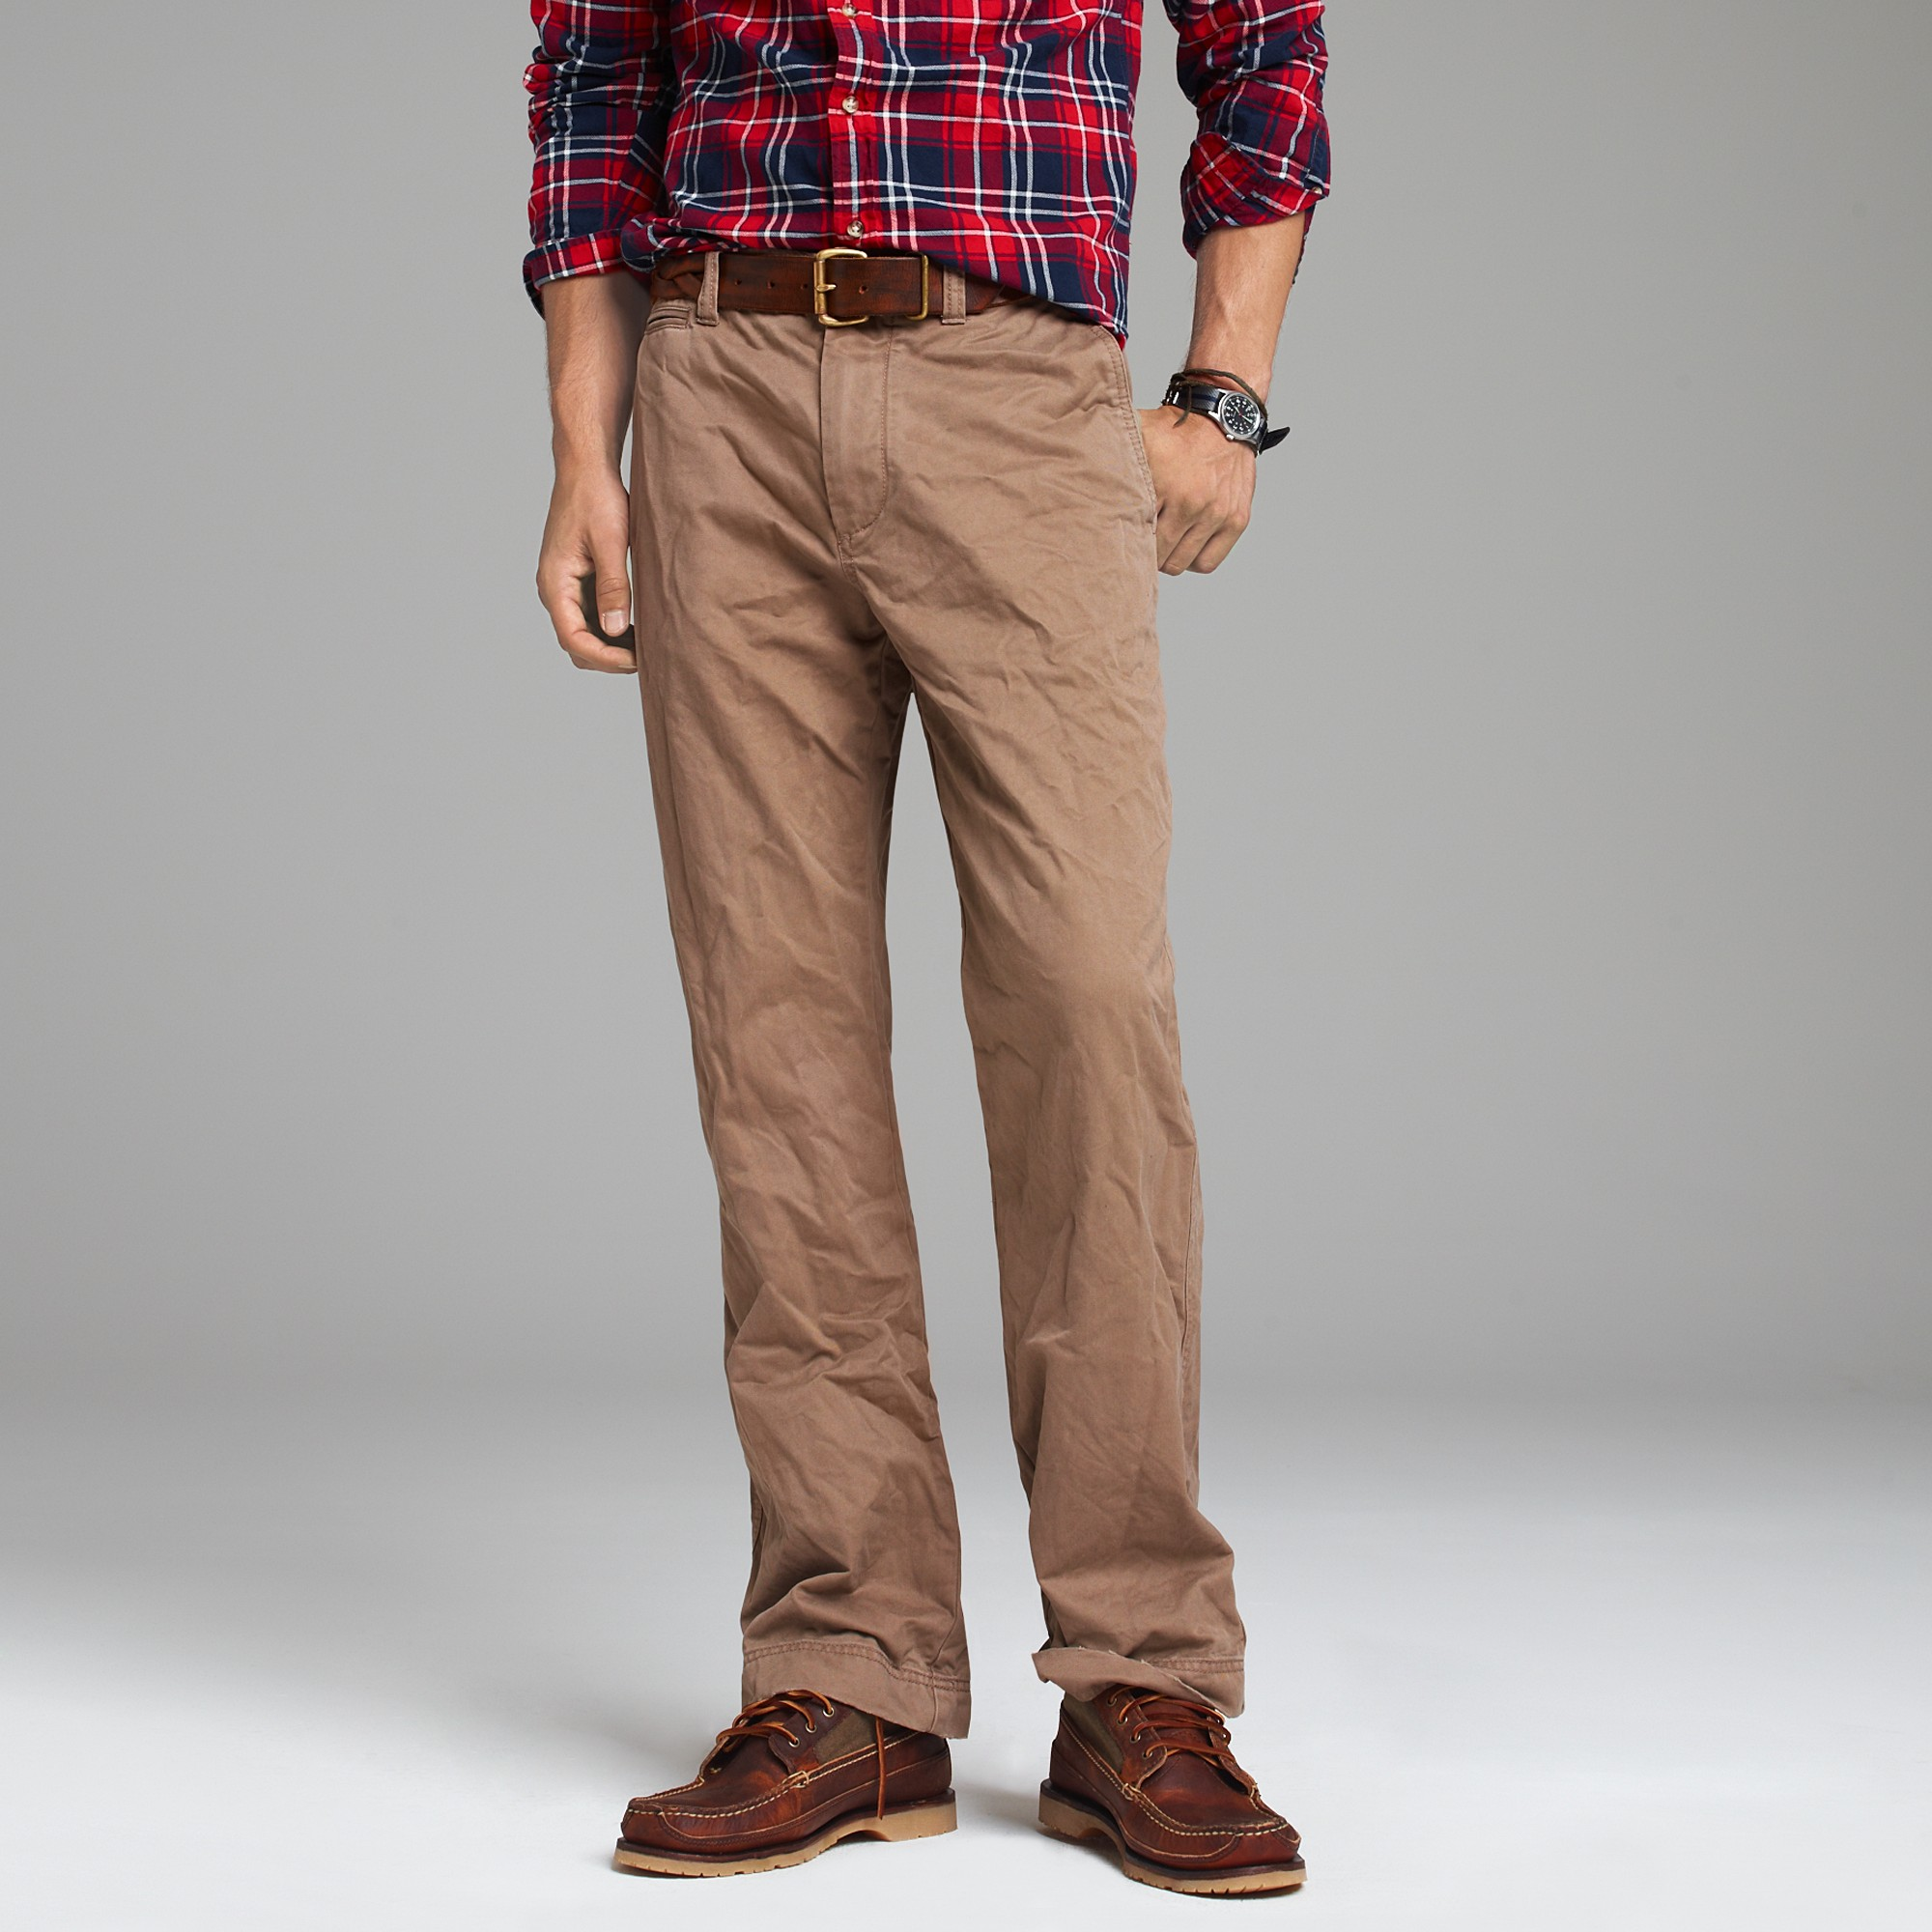 Dark Red Jeans Mens